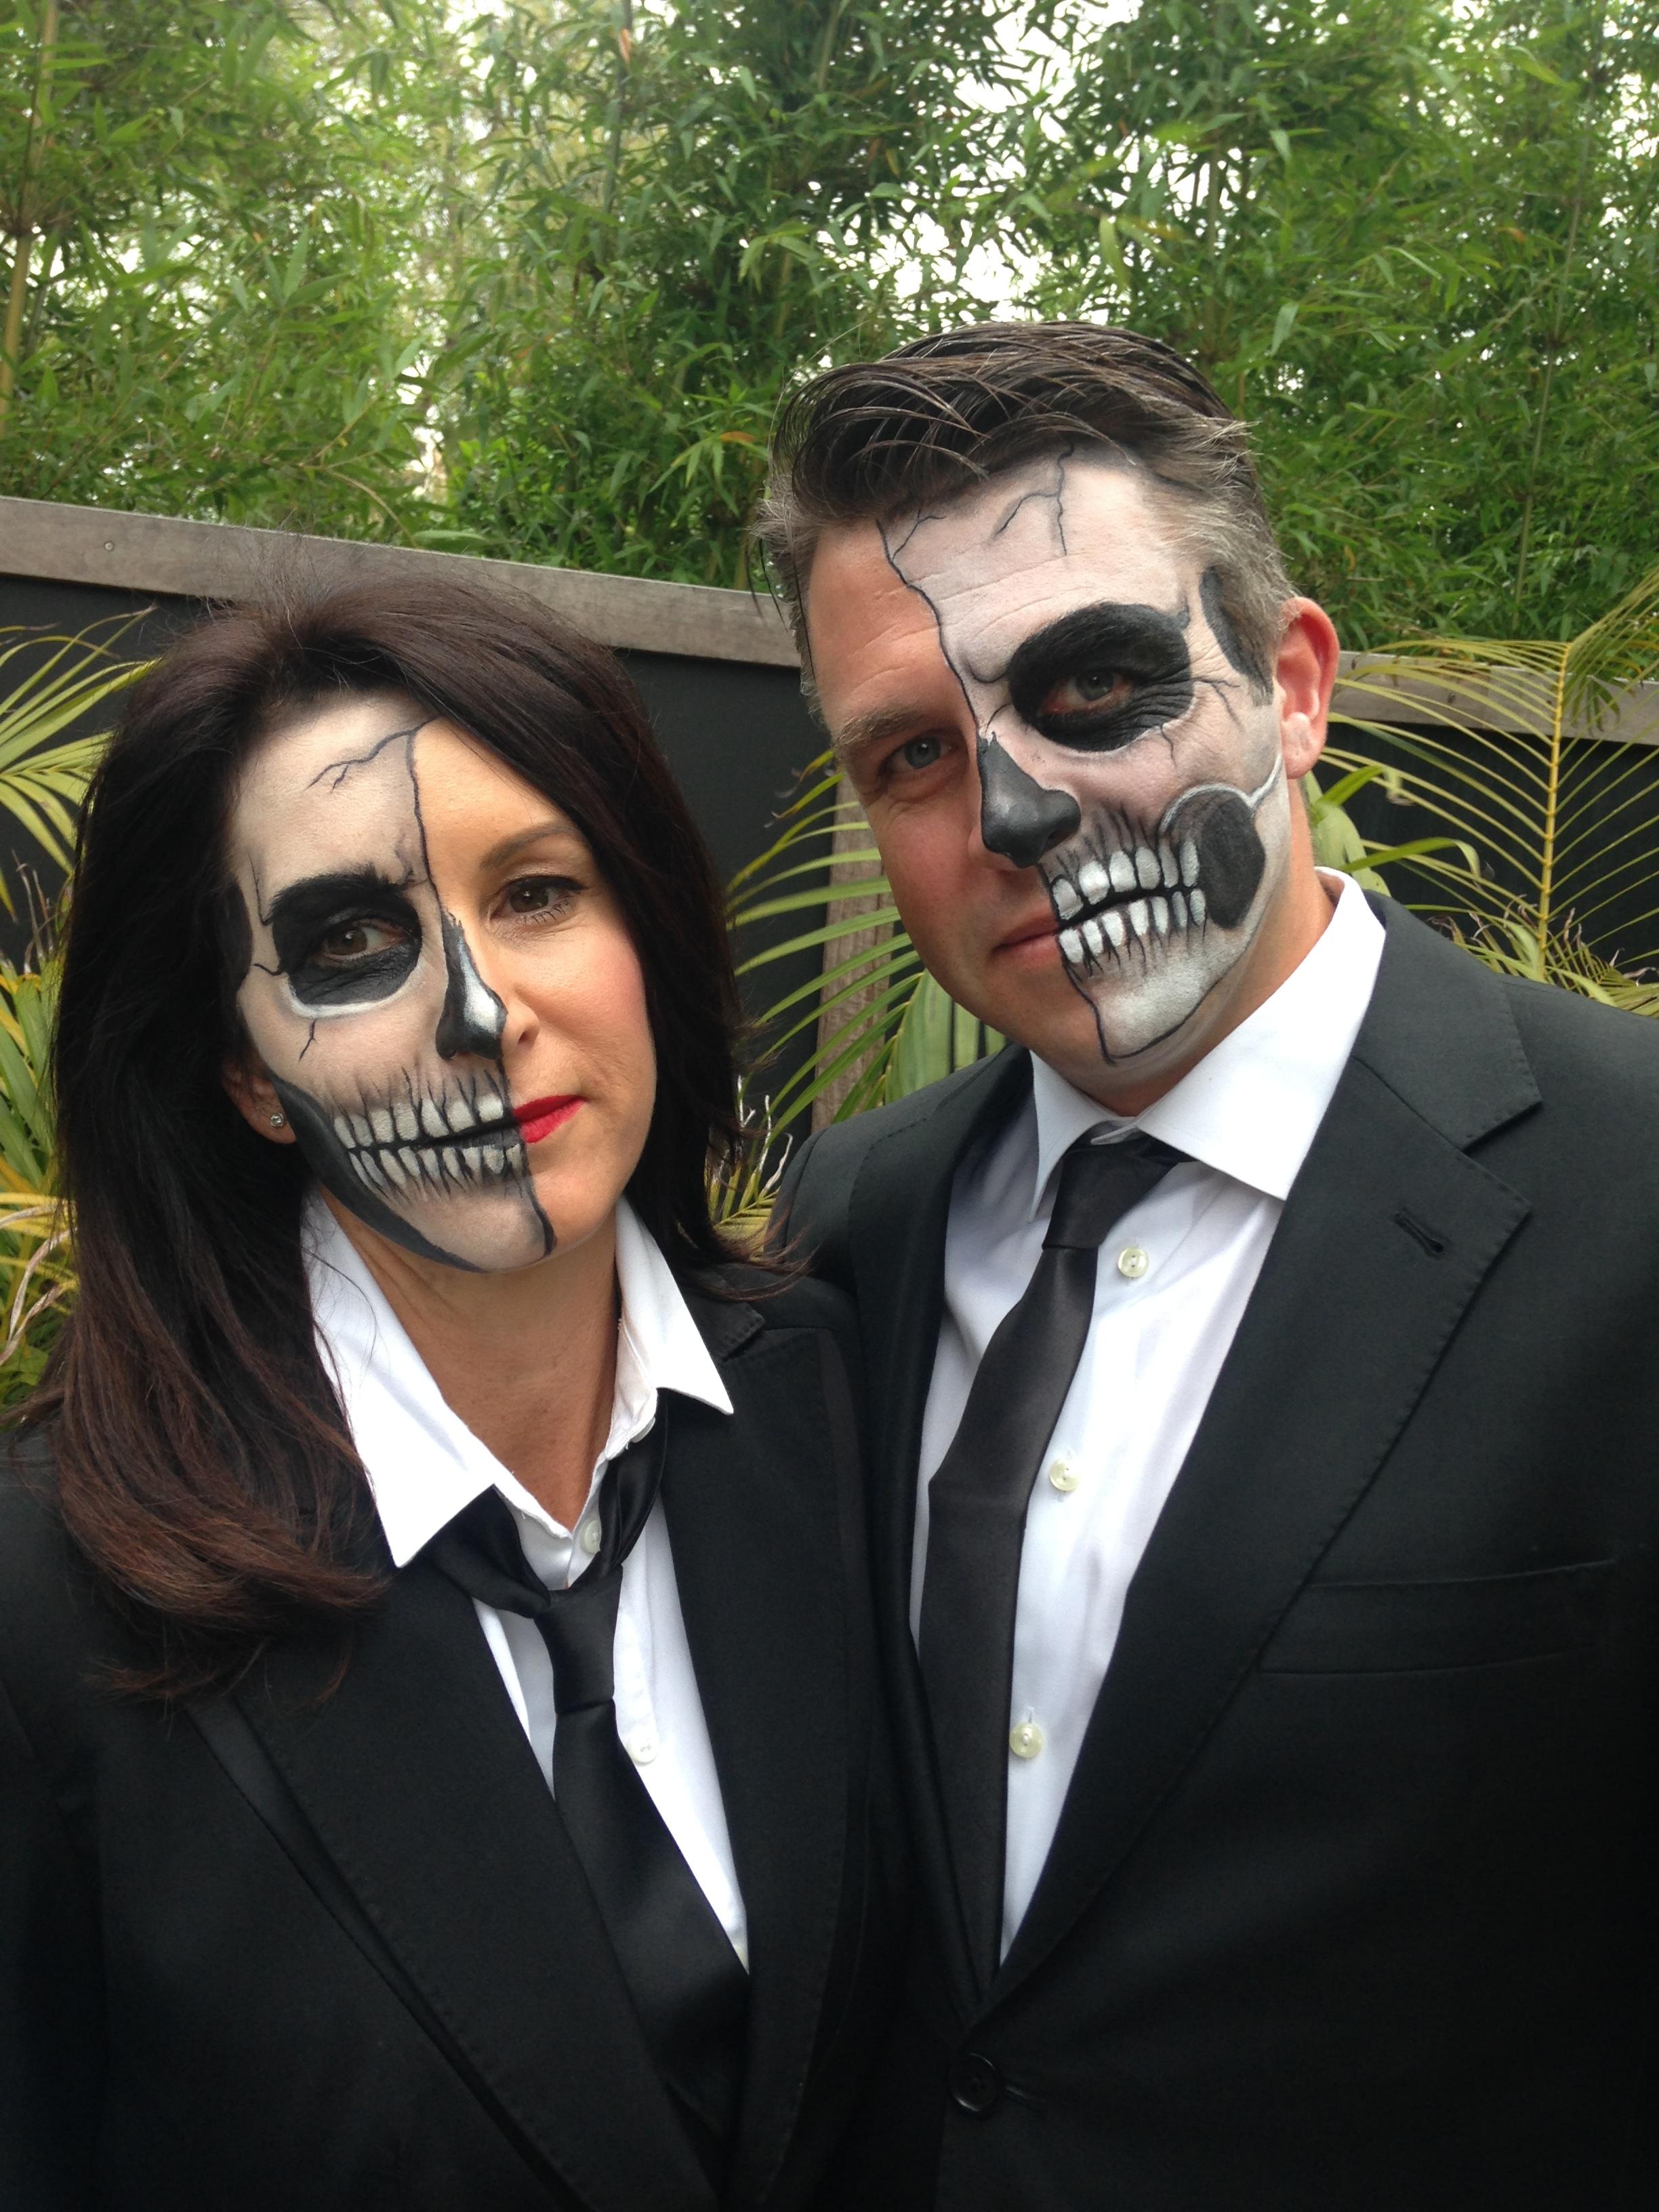 Halloween makeup design for clients